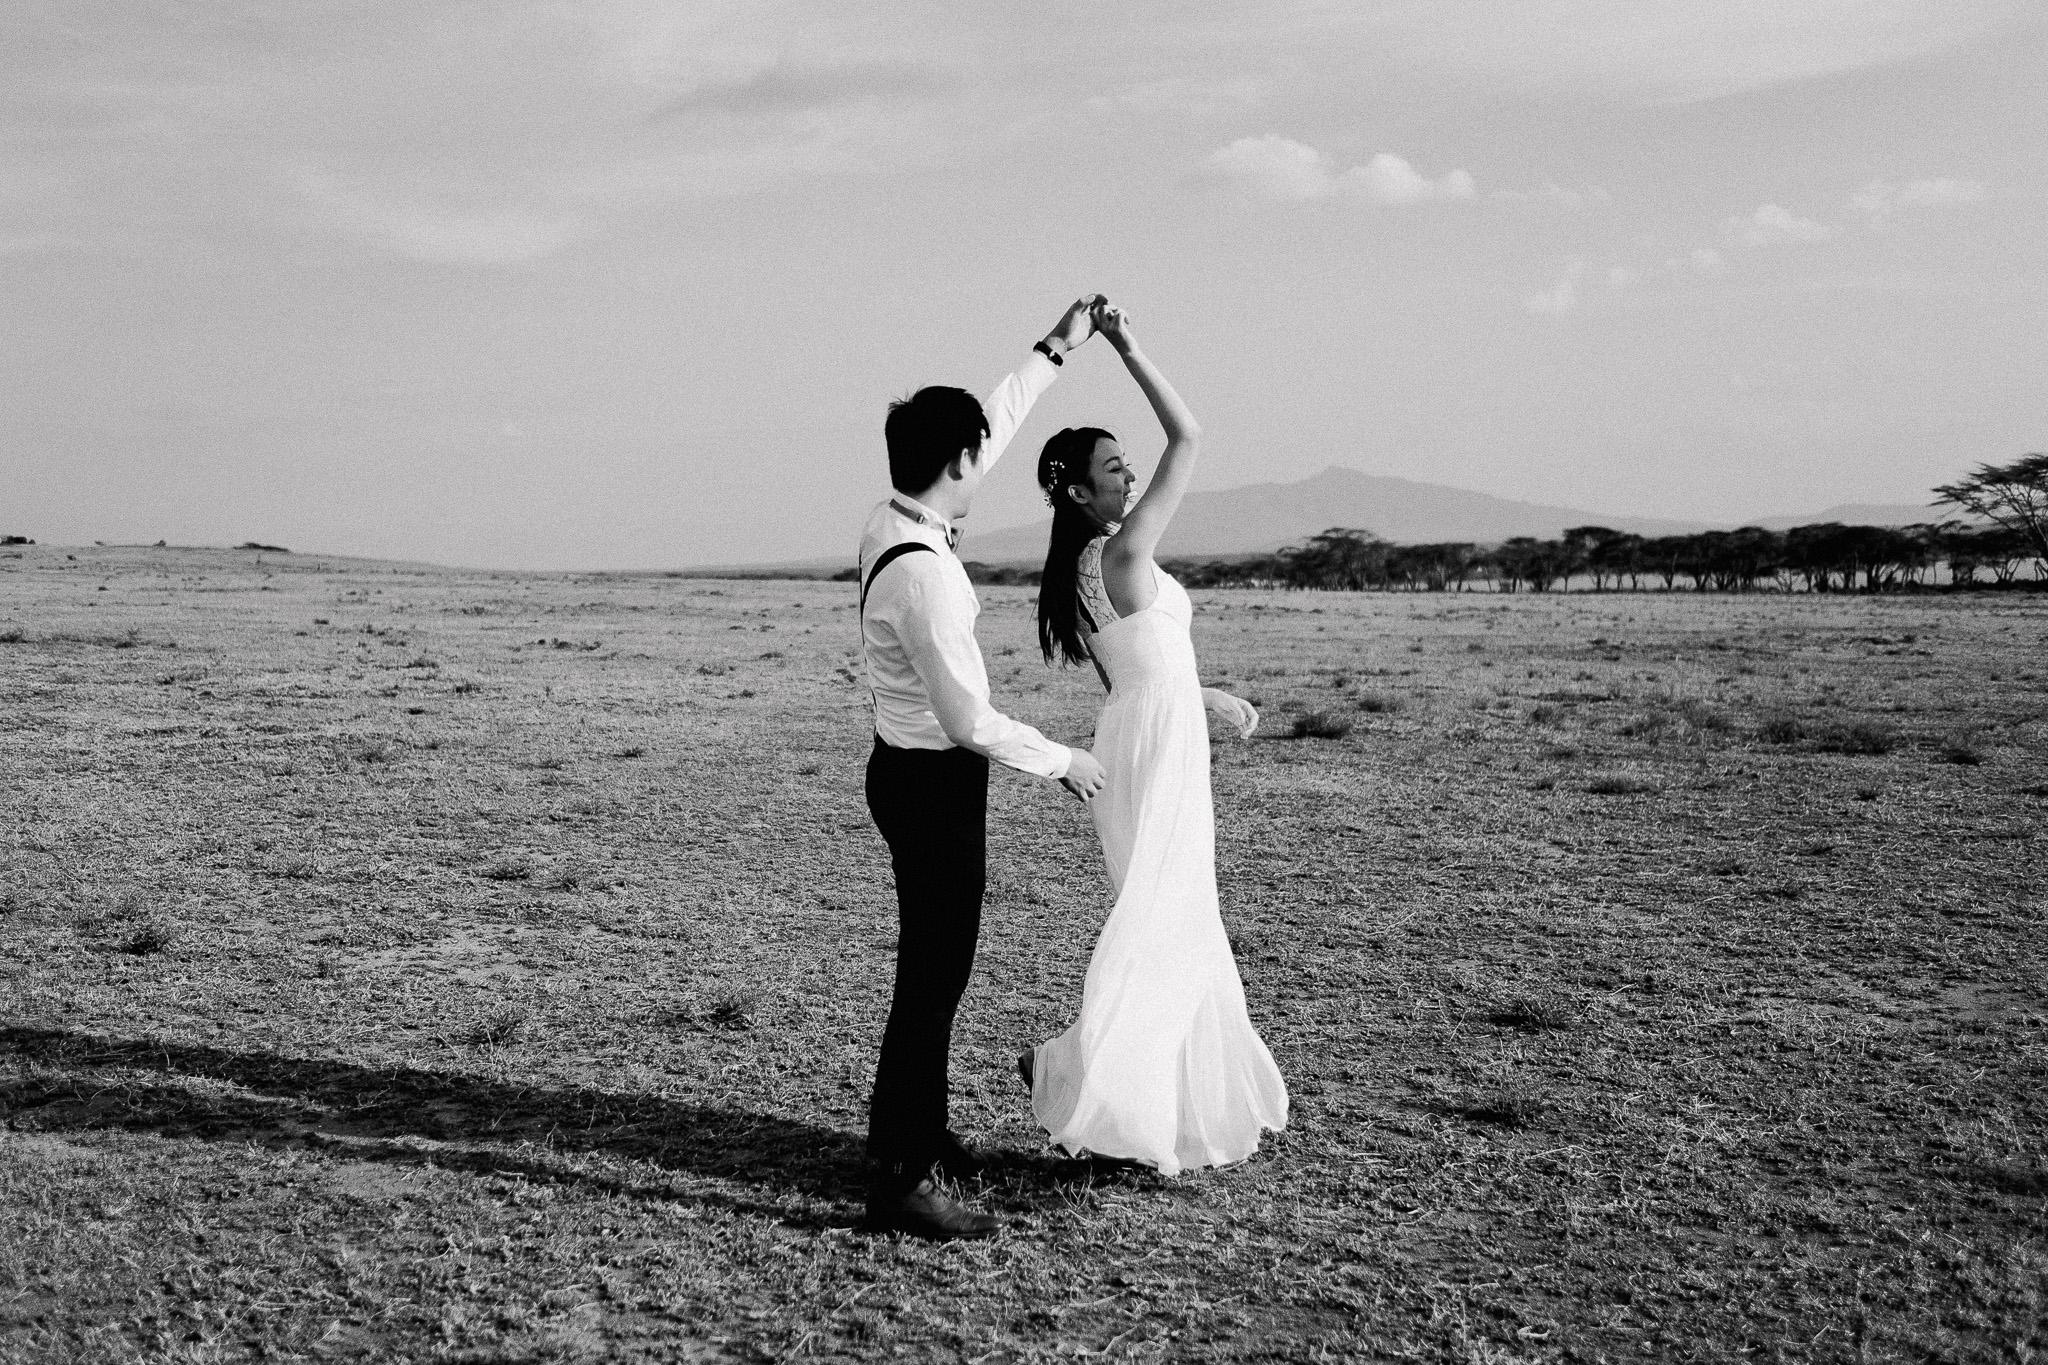 Anna-Hari-Photography-Safari-Elopement-Kenya-Wedding-Photographer-Kenya-65.jpg